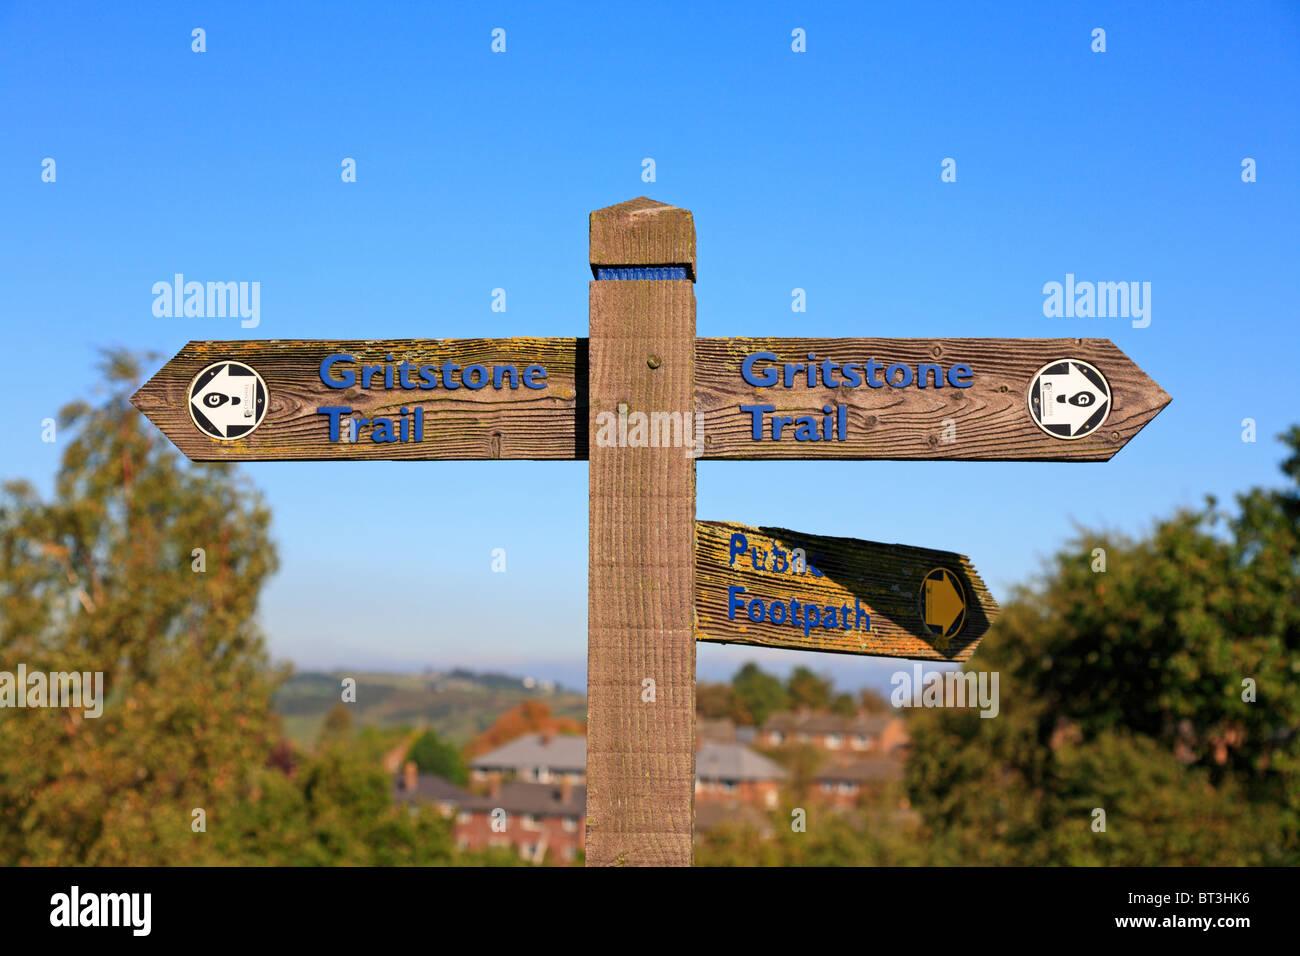 Gritstone Trail waymarker, Disley, Peak District National Park, Cheshire, England, UK. - Stock Image